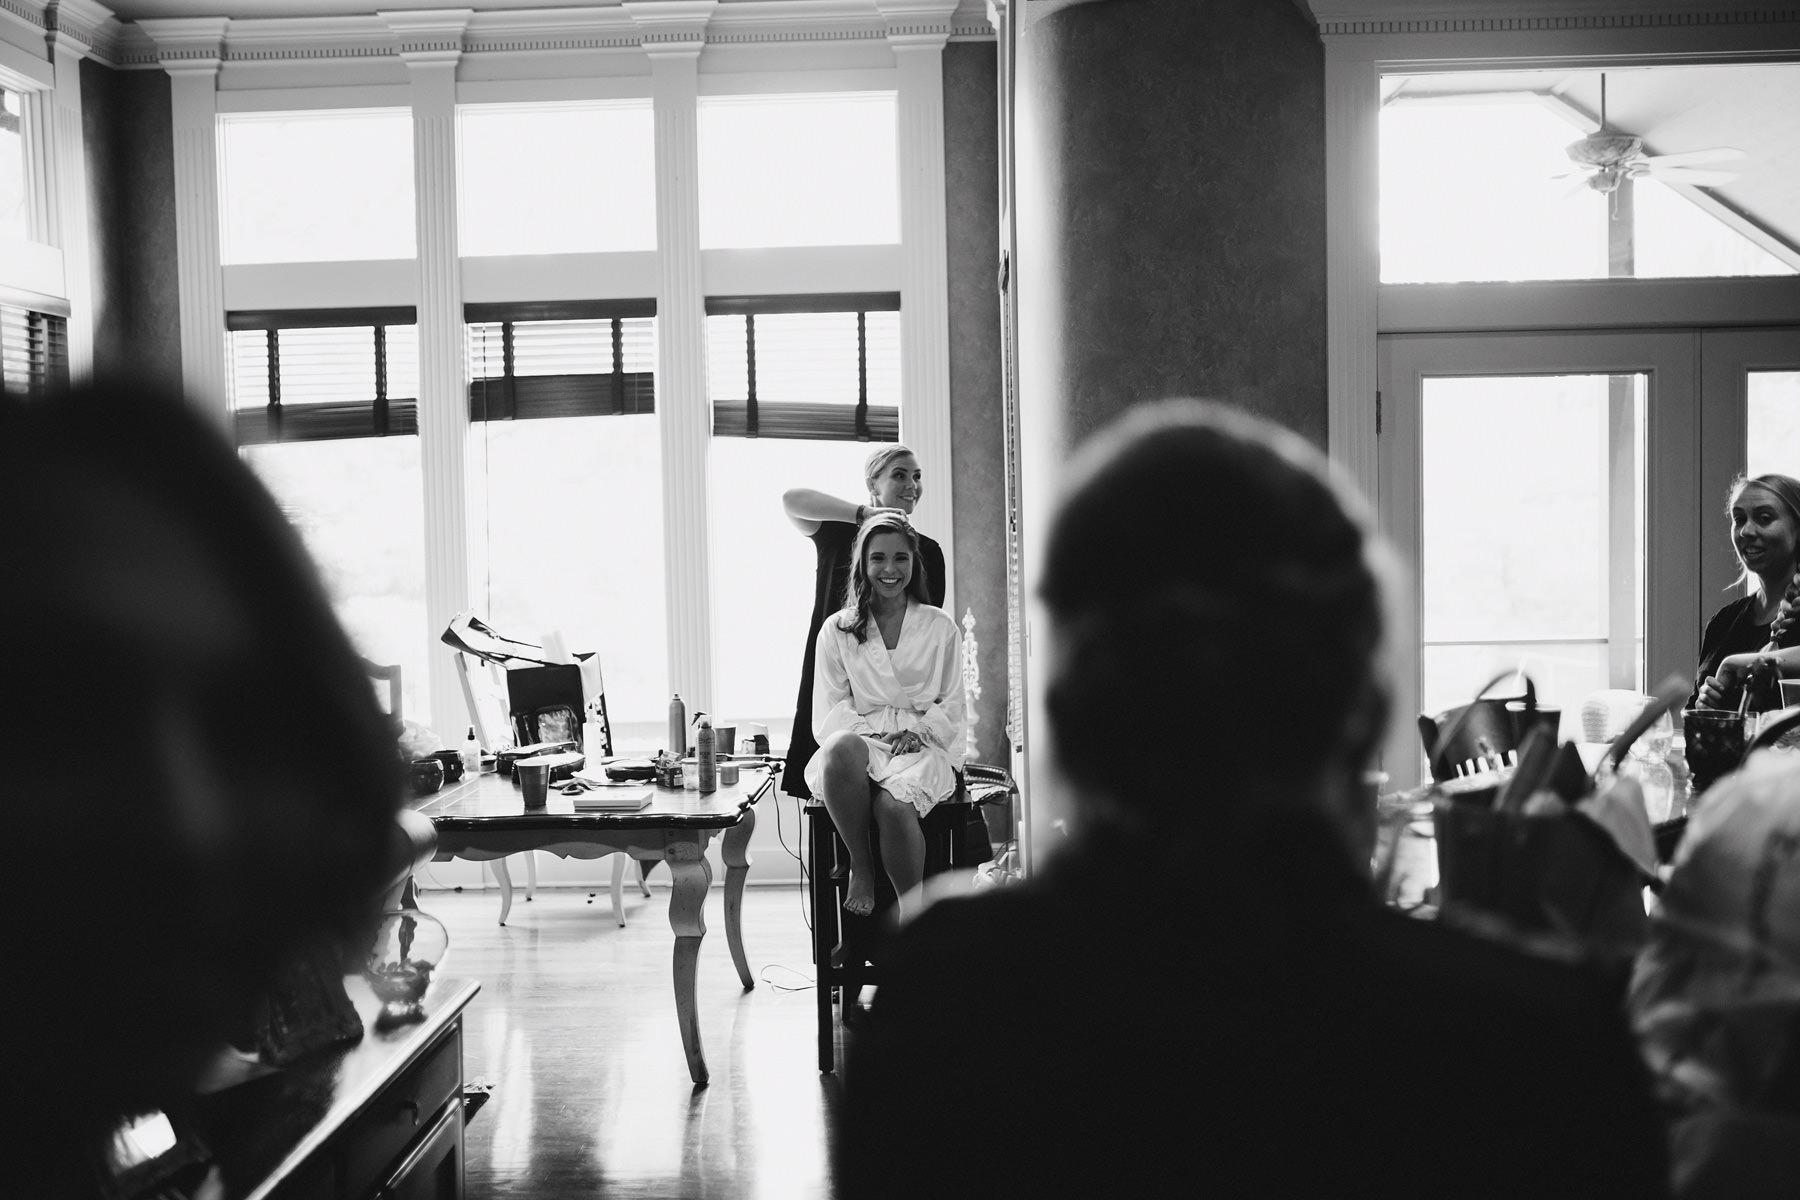 Kansas City Summer Wedding at the Guild_Kindling Wedding Photography Blog18.JPG